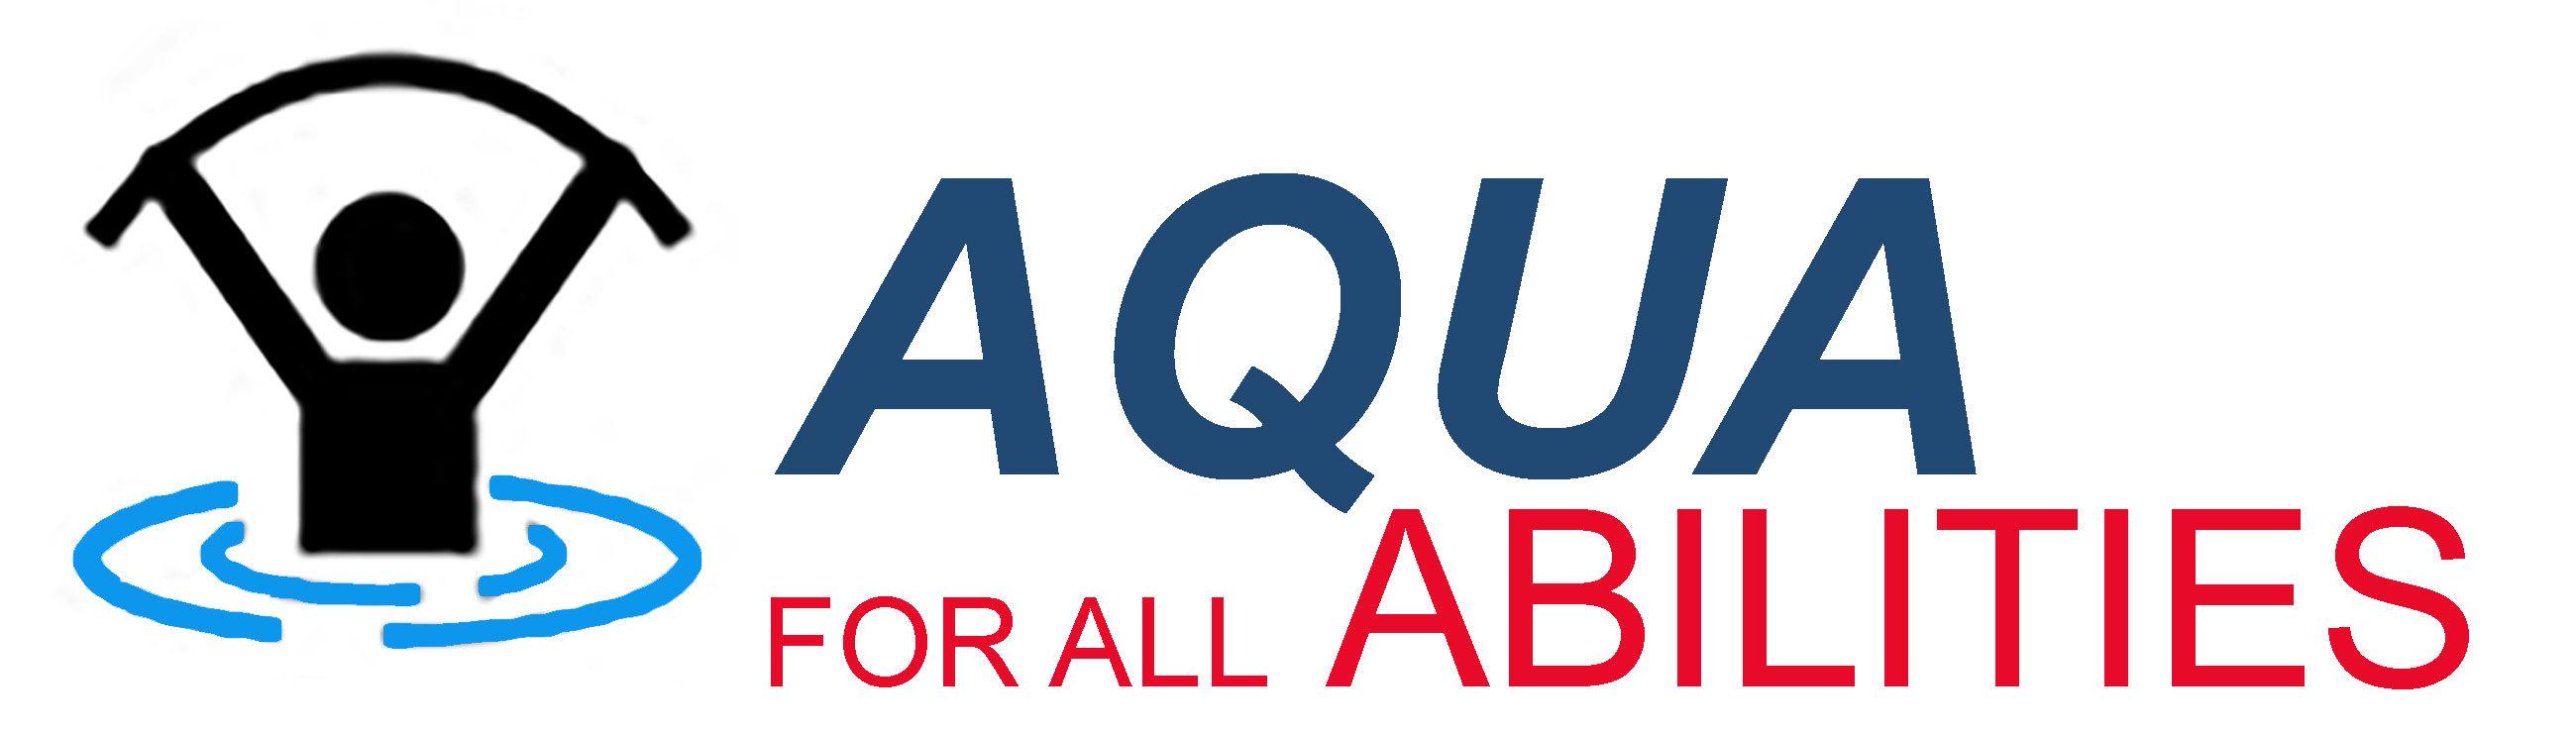 Aqua for all abilities